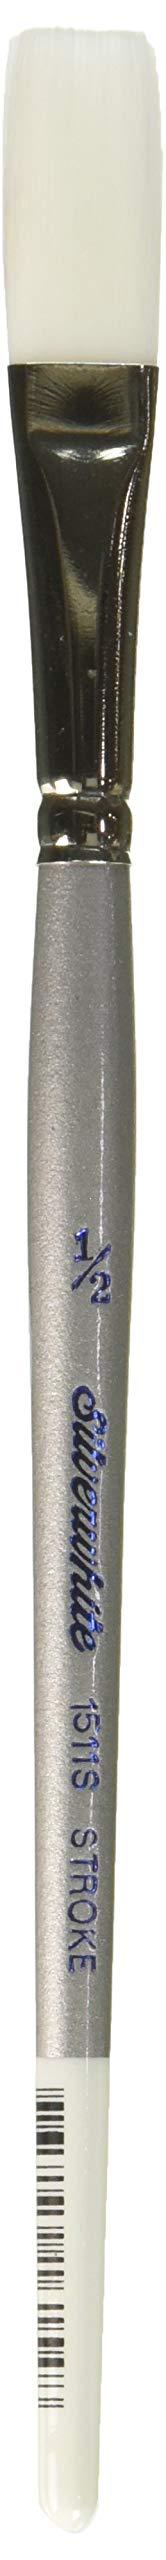 Silver Brush 1511S-012 Silverwhite Short Handle White Taklon Brush, Stroke, 1/2-Inch by Silver Brush Limited